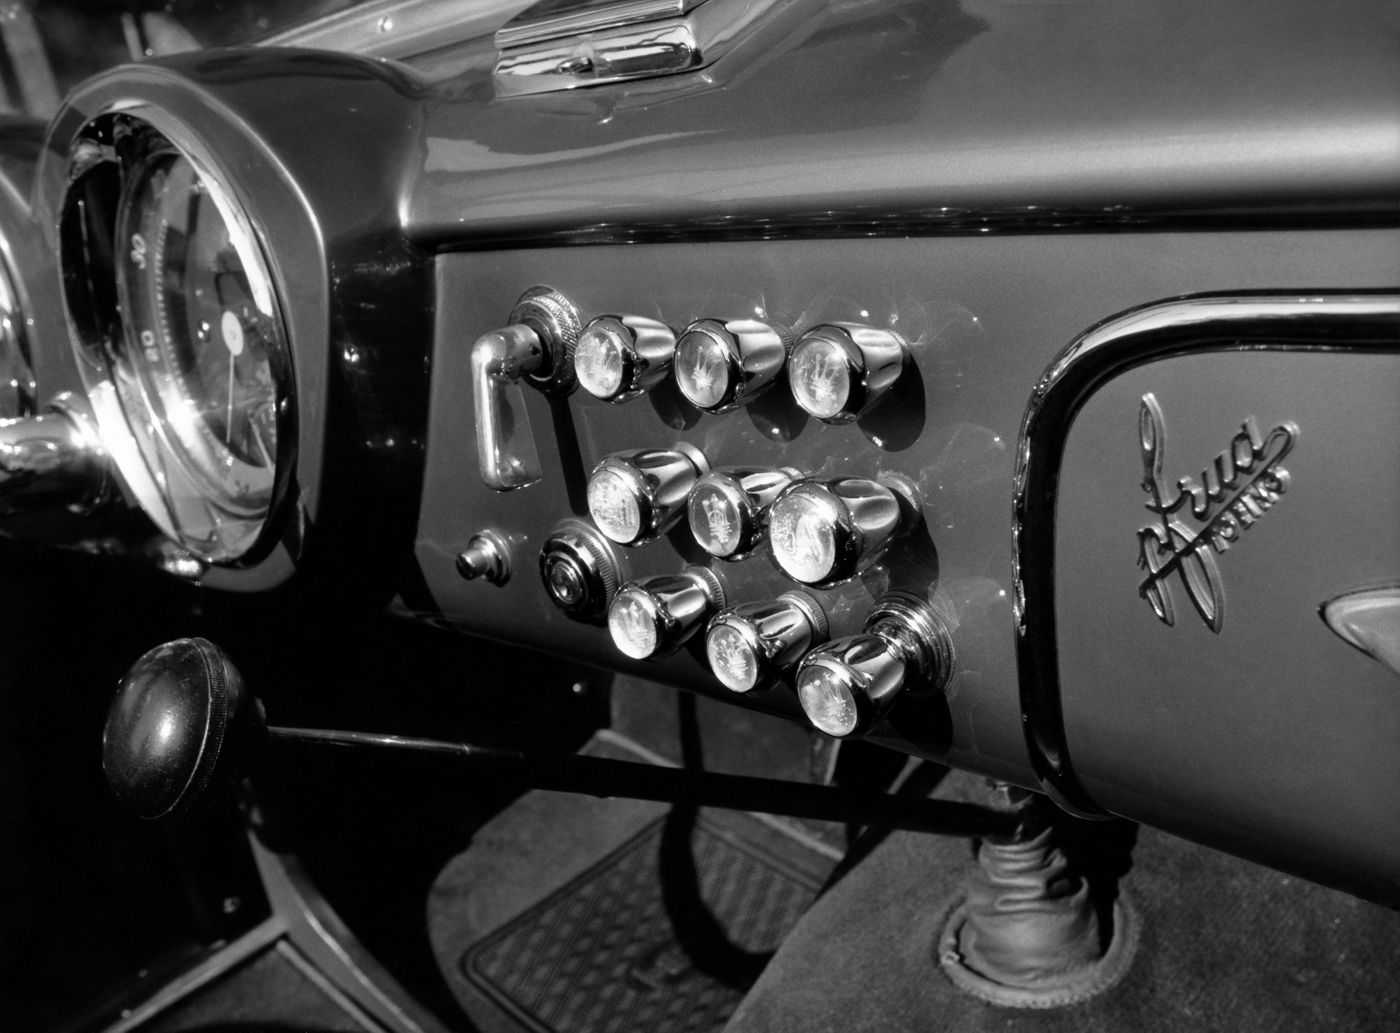 1950 Maserati A6G 2000 - interior details of the classic car model